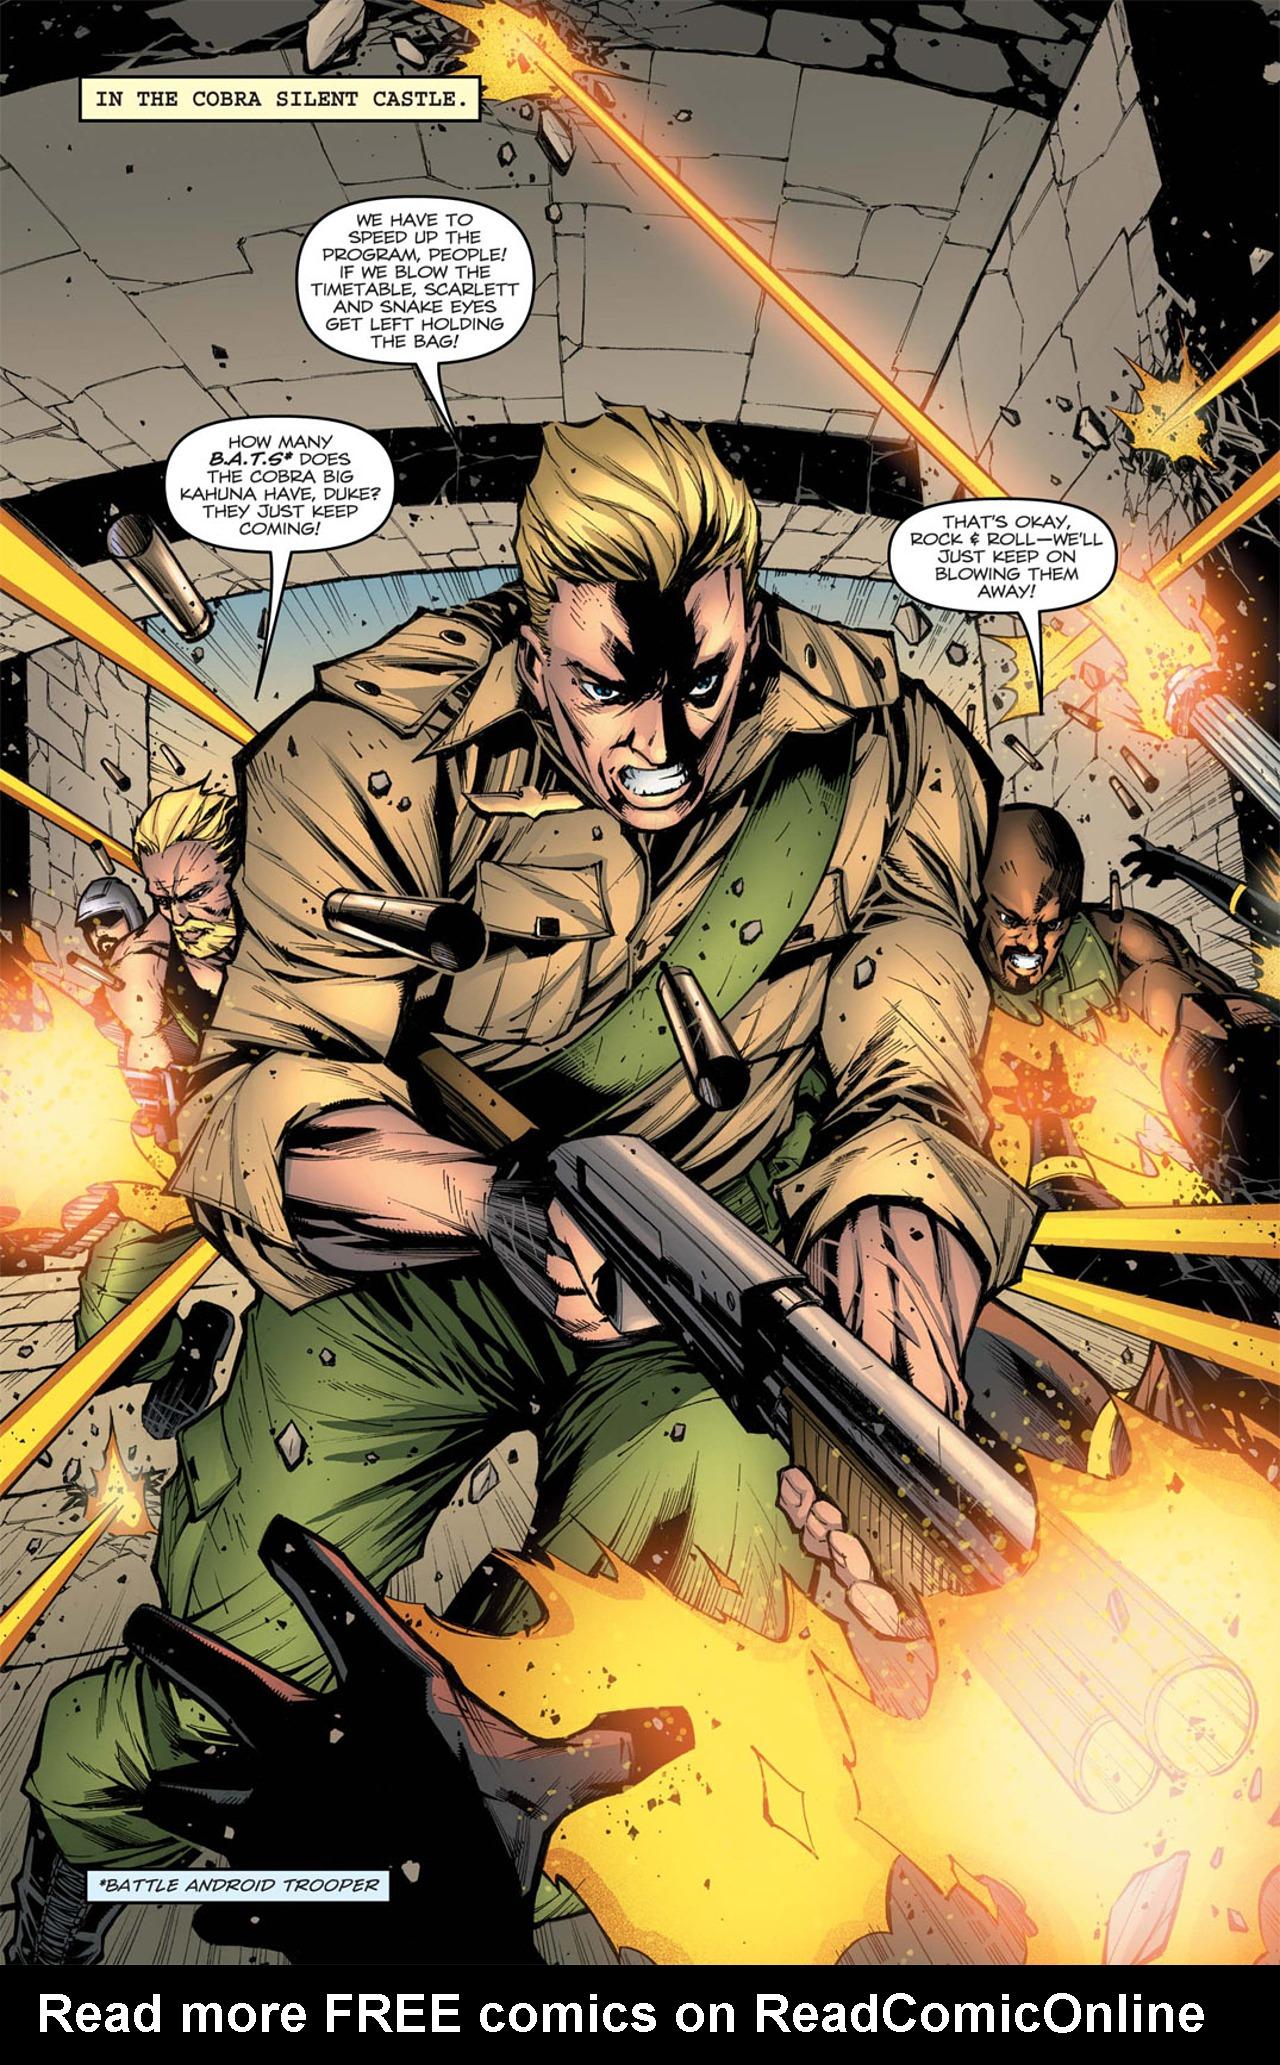 G.I. Joe: A Real American Hero 159 Page 4